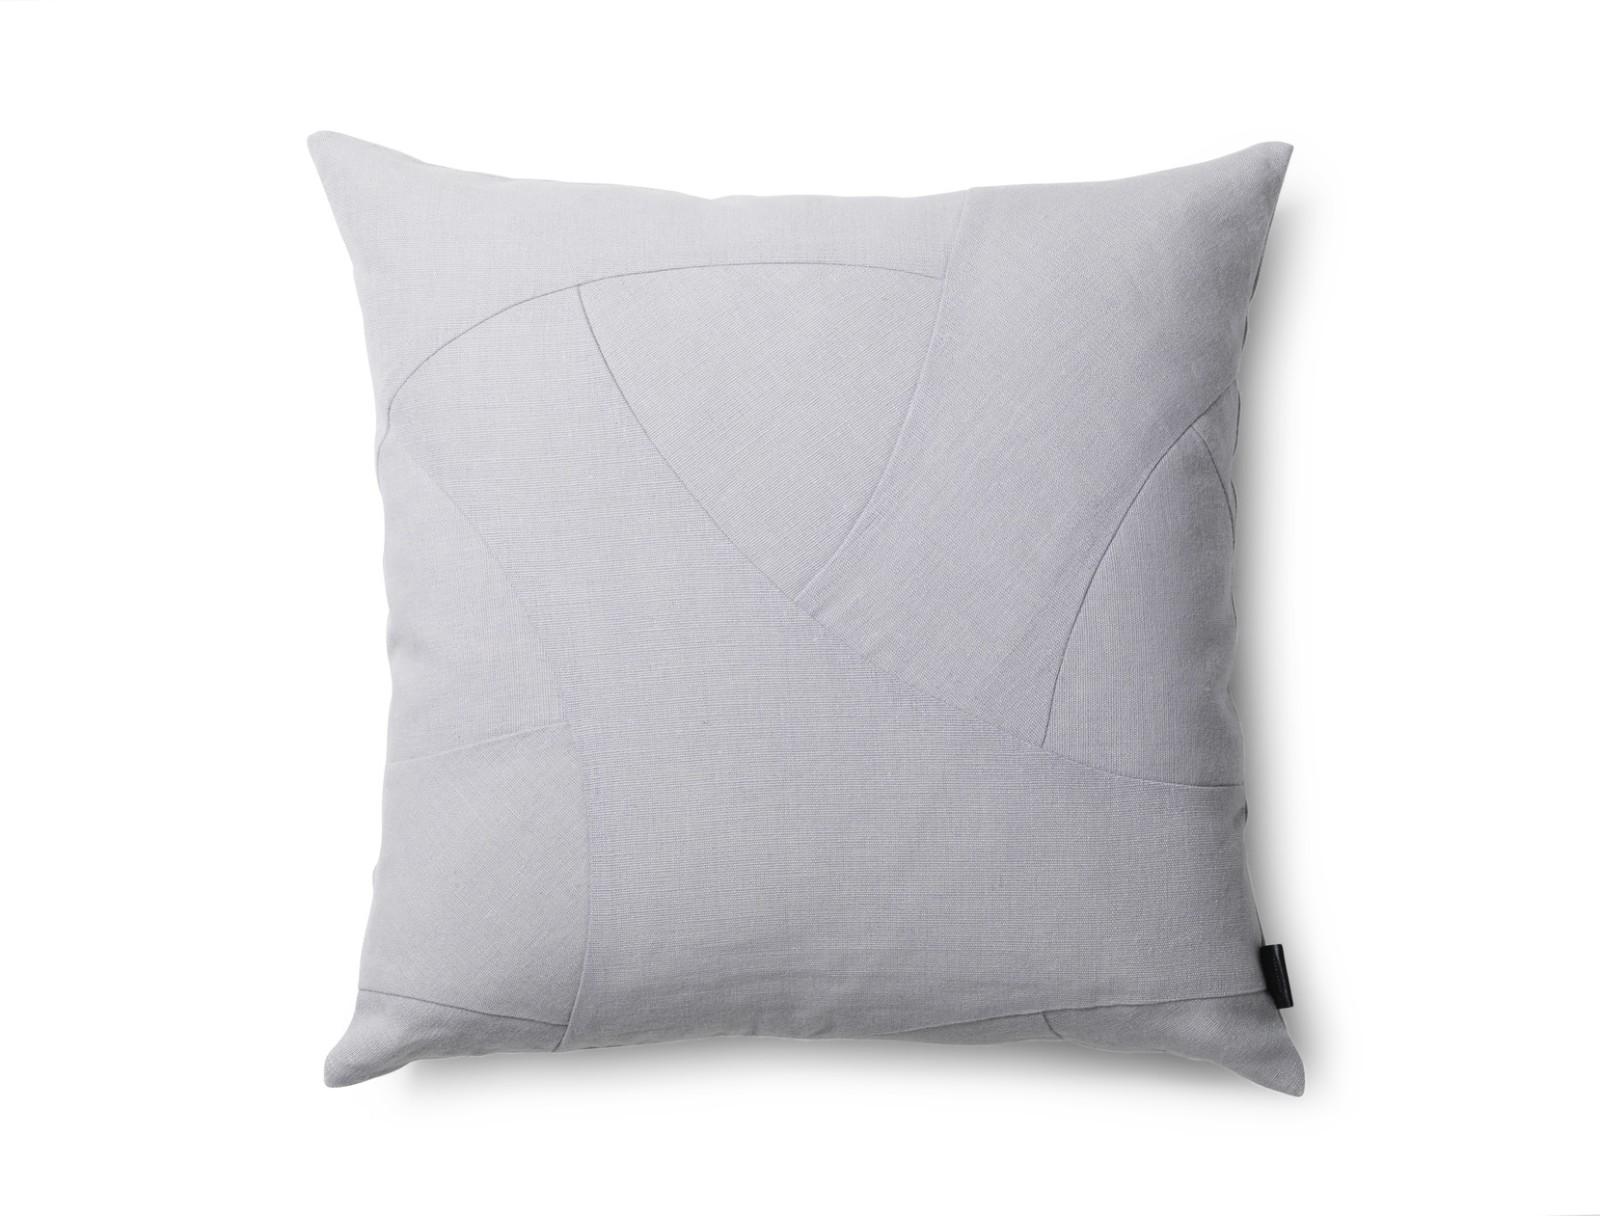 Flow Cushion, Square - Set of 2 Grey